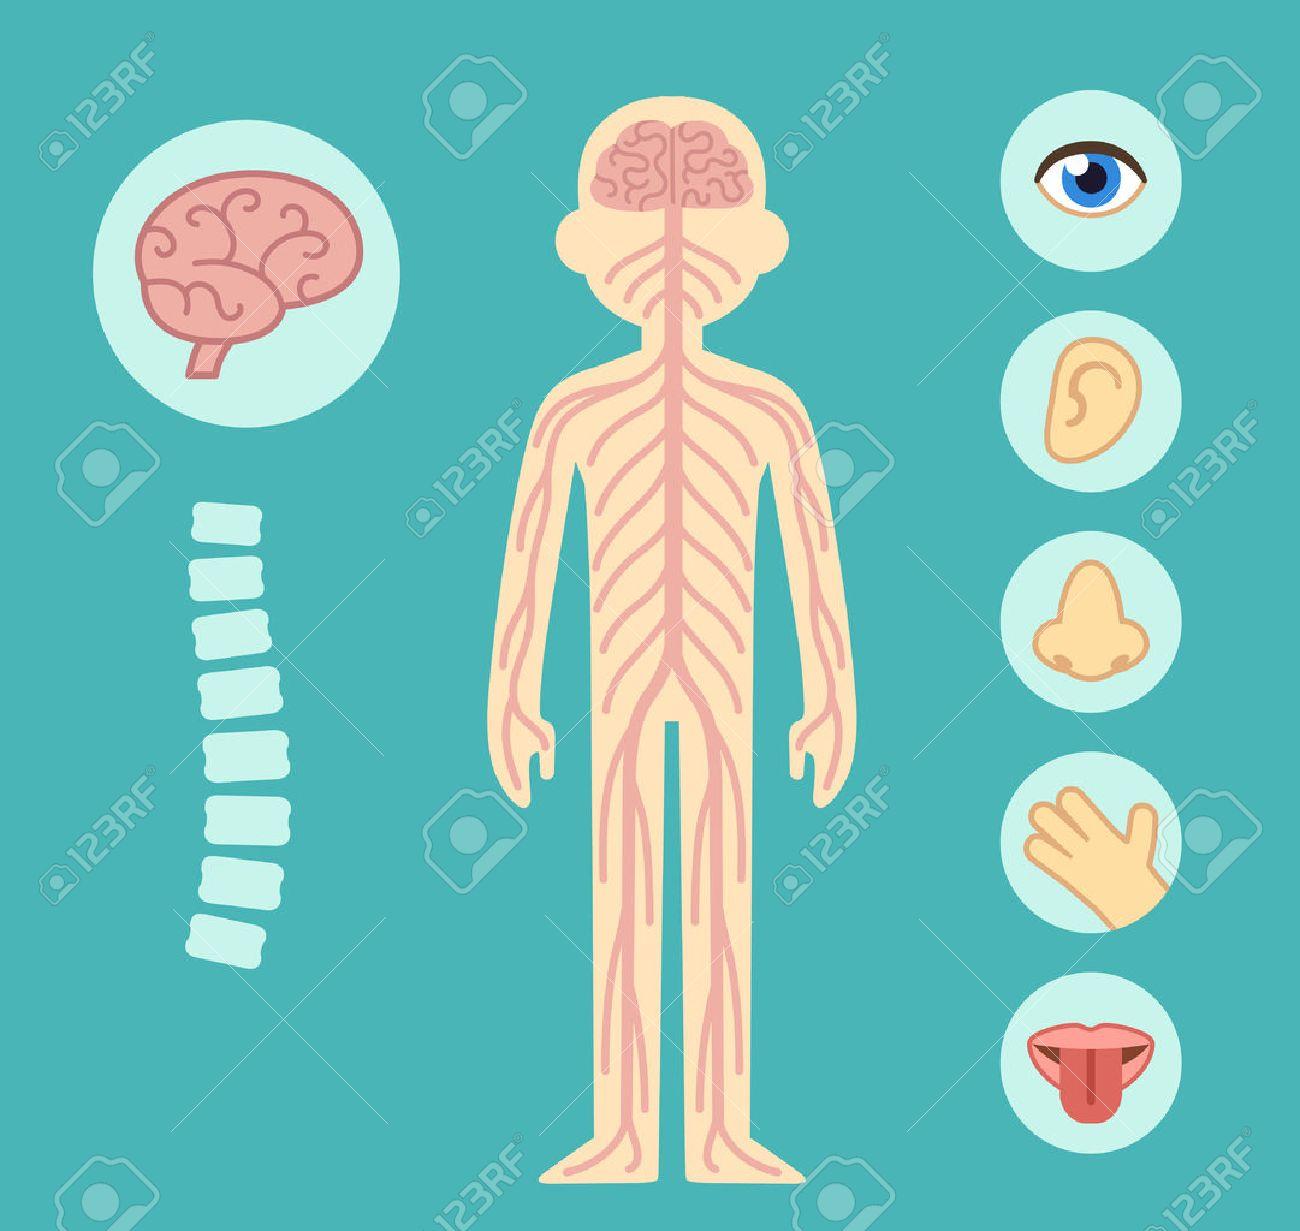 Nervous System Infographic Chart Elements Nerves Spine Brain